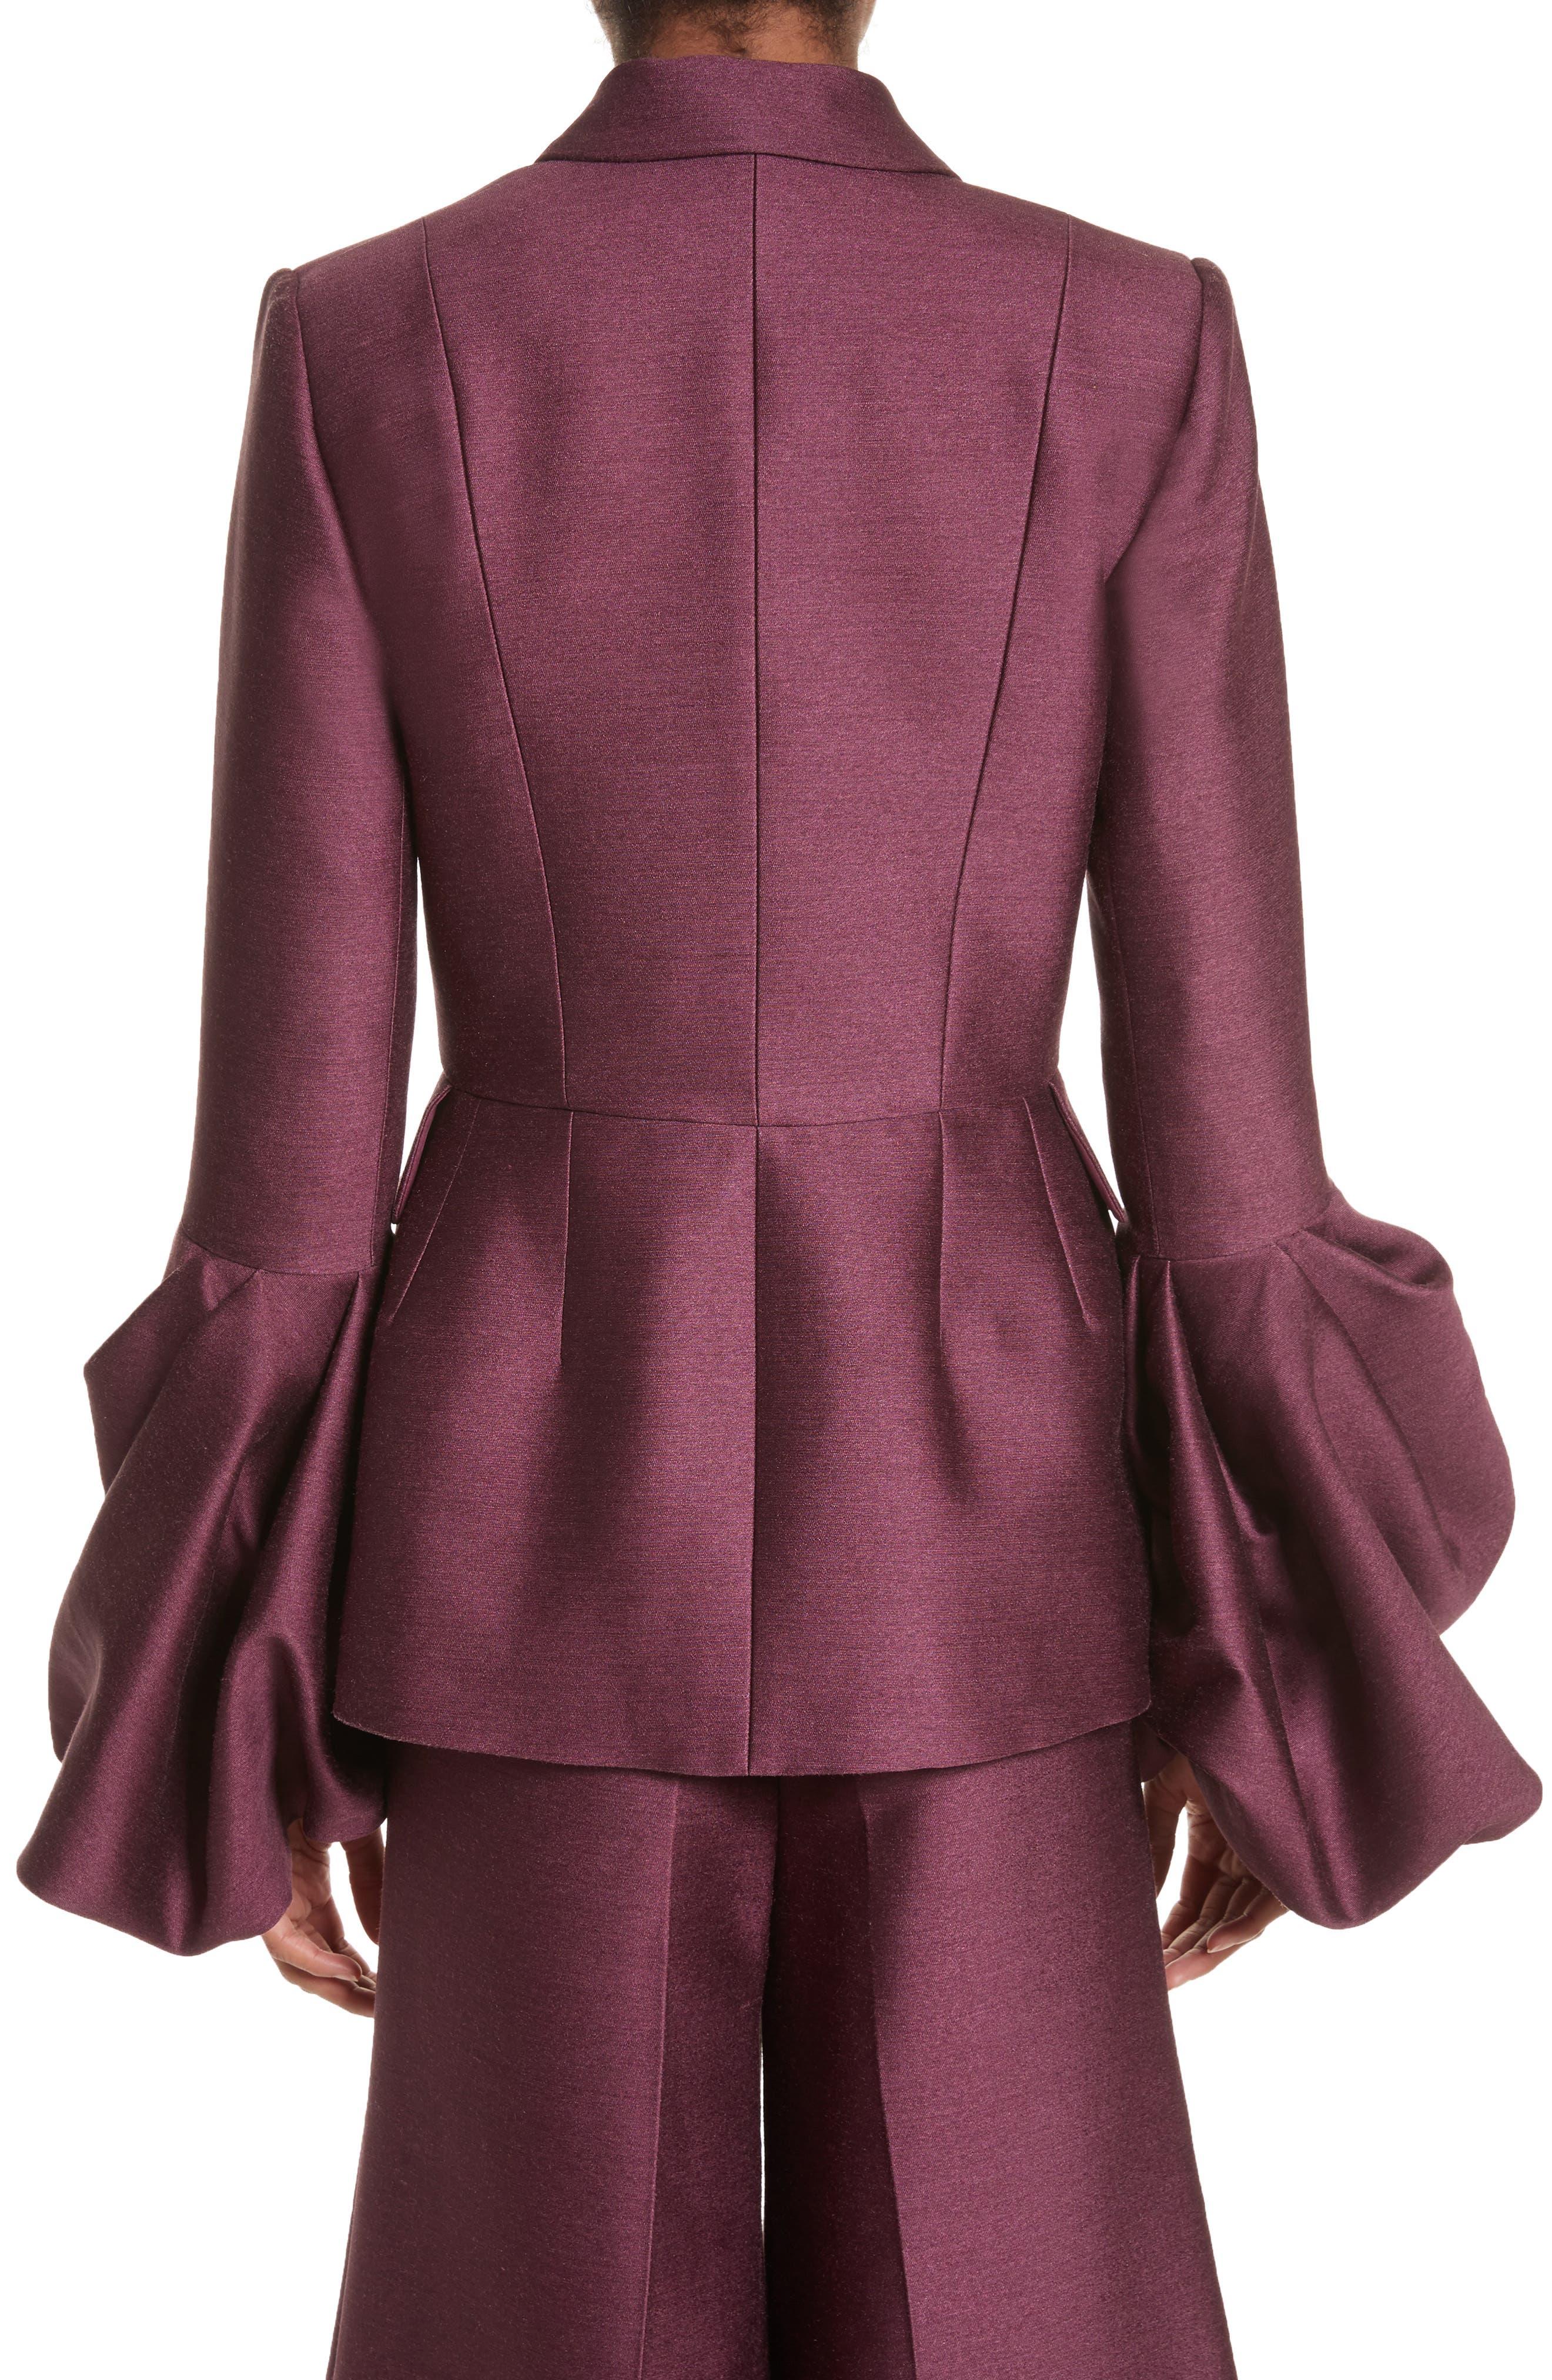 Narika Wool & Silk Jacket,                             Alternate thumbnail 2, color,                             500